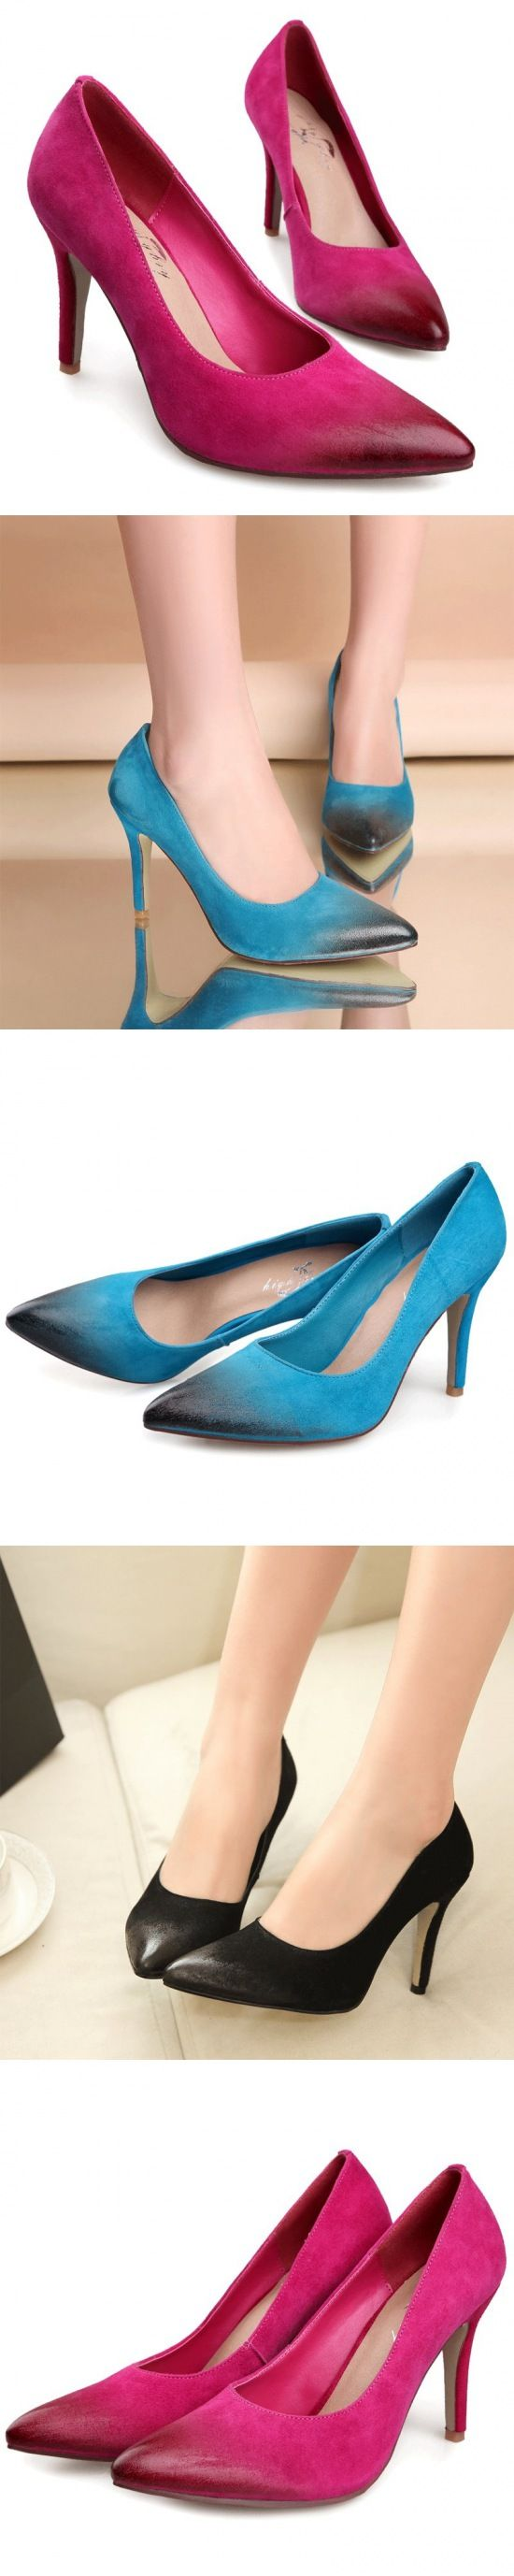 camo color cork bottom shoes